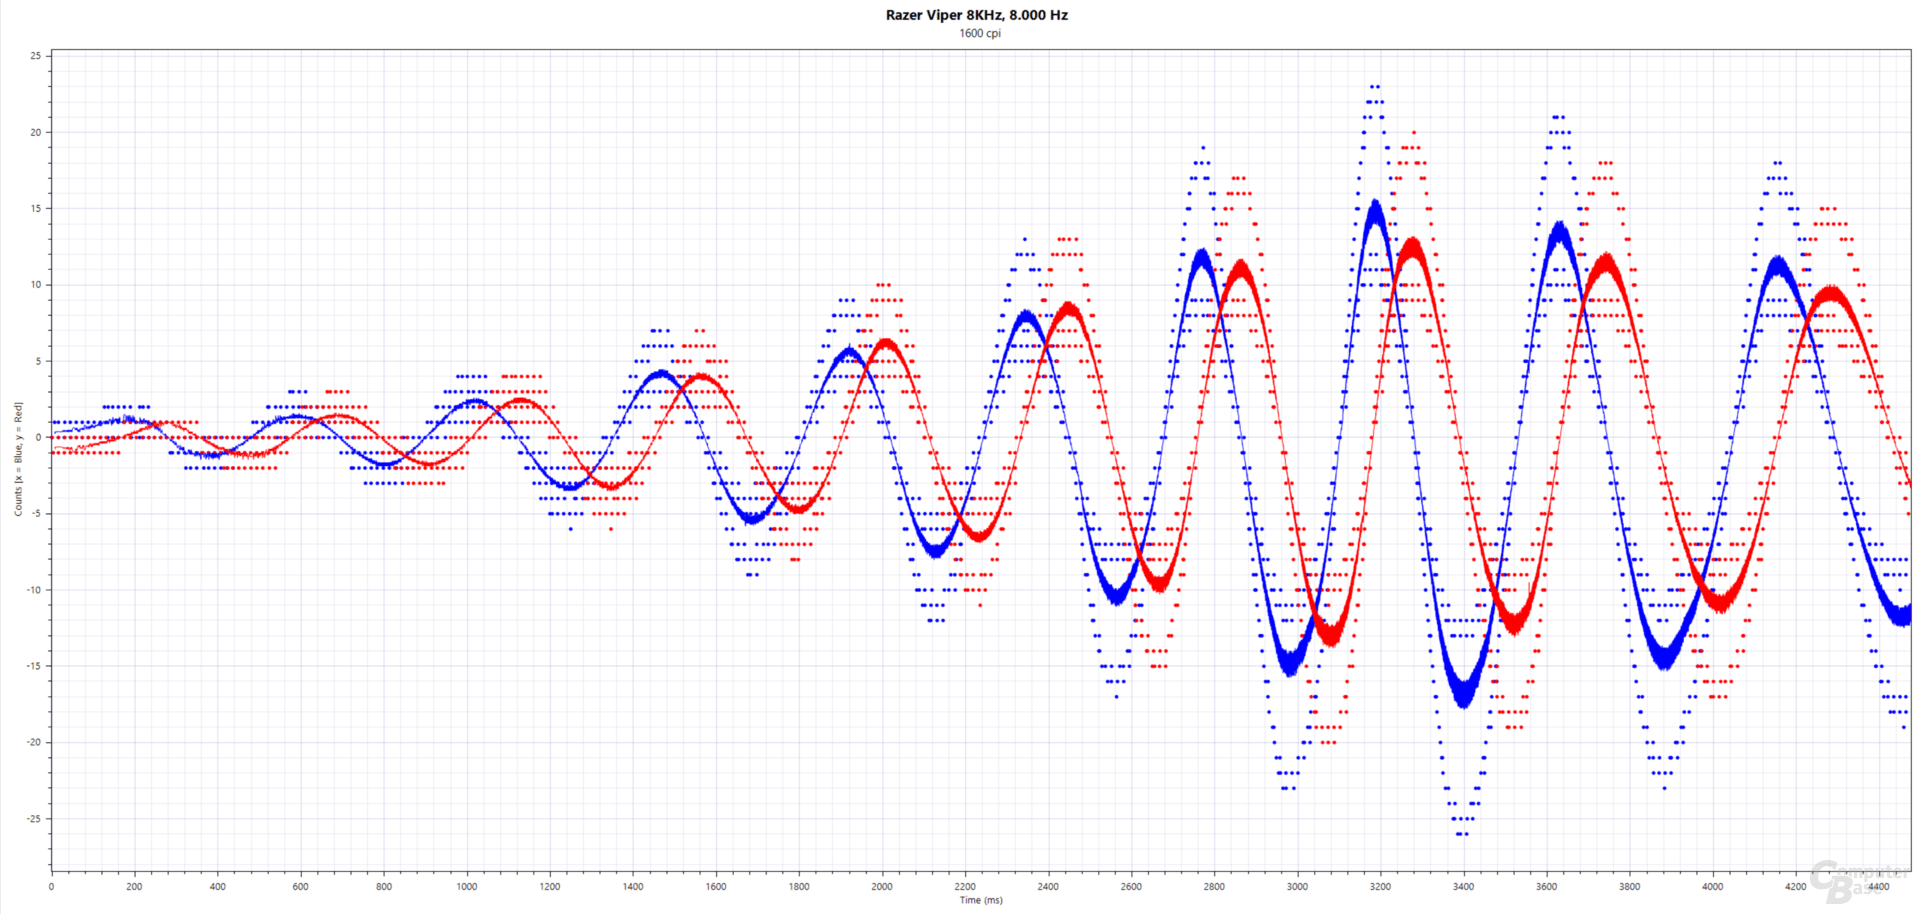 Blau: xCounts(ms), Rot: yCounts(ms); Razer Viper 8KHz (PMW-3399, 1.600 cpi, 8.000 Hertz, Stoffmauspad)